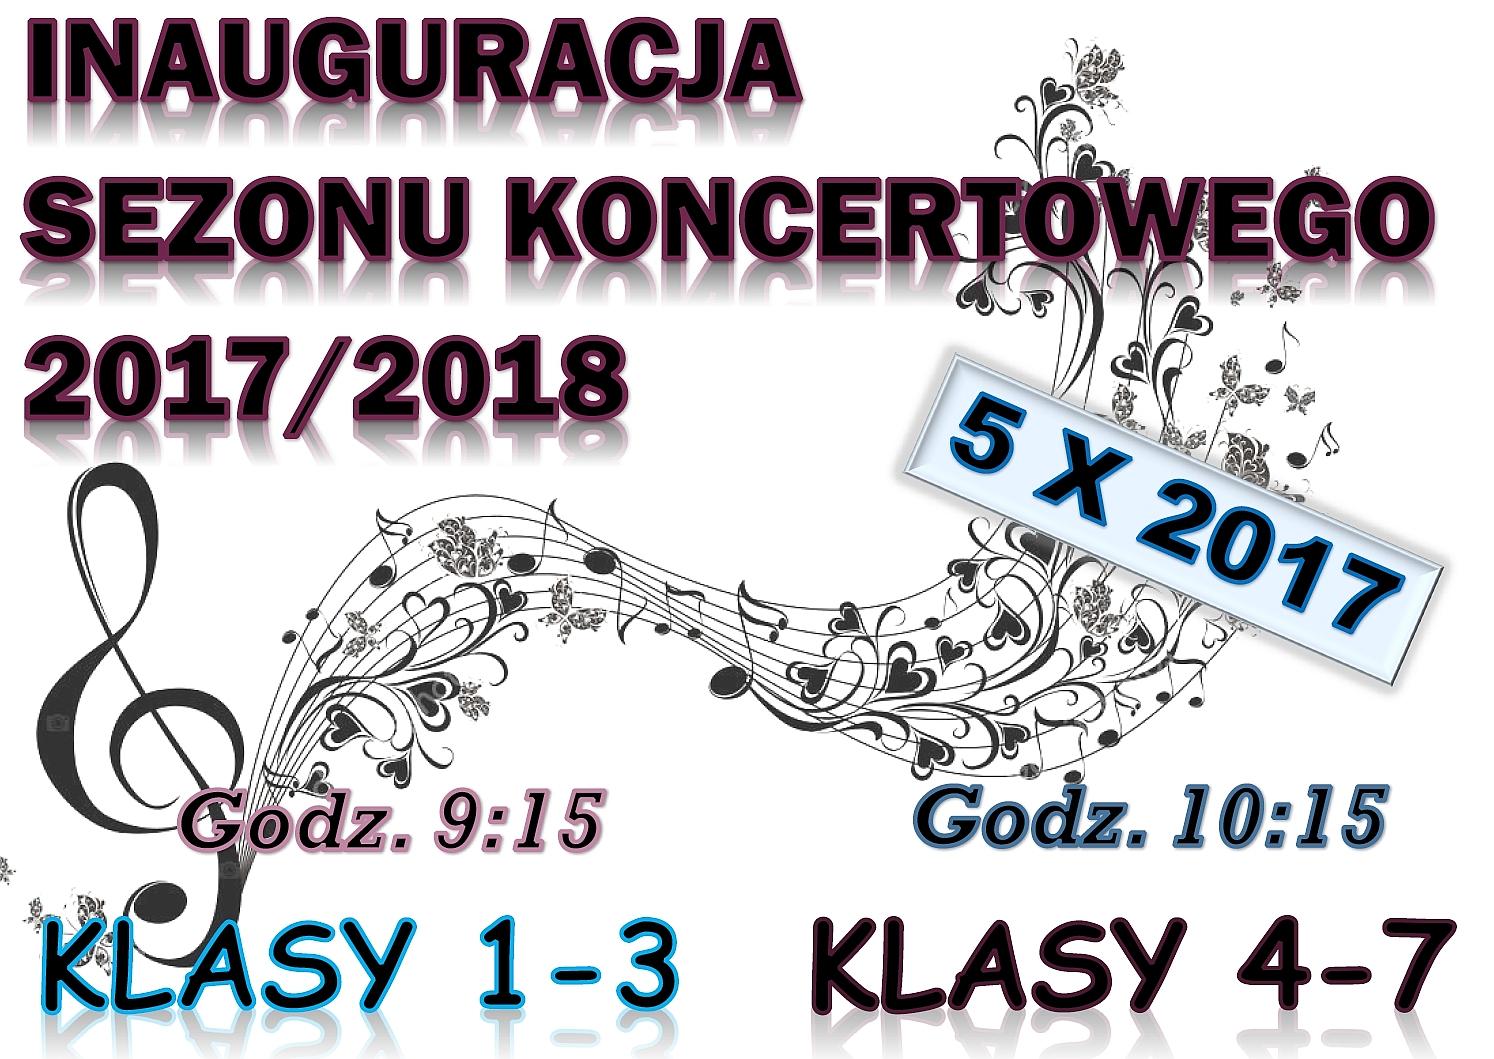 inauguracja_sezonu_koncertowego_2017